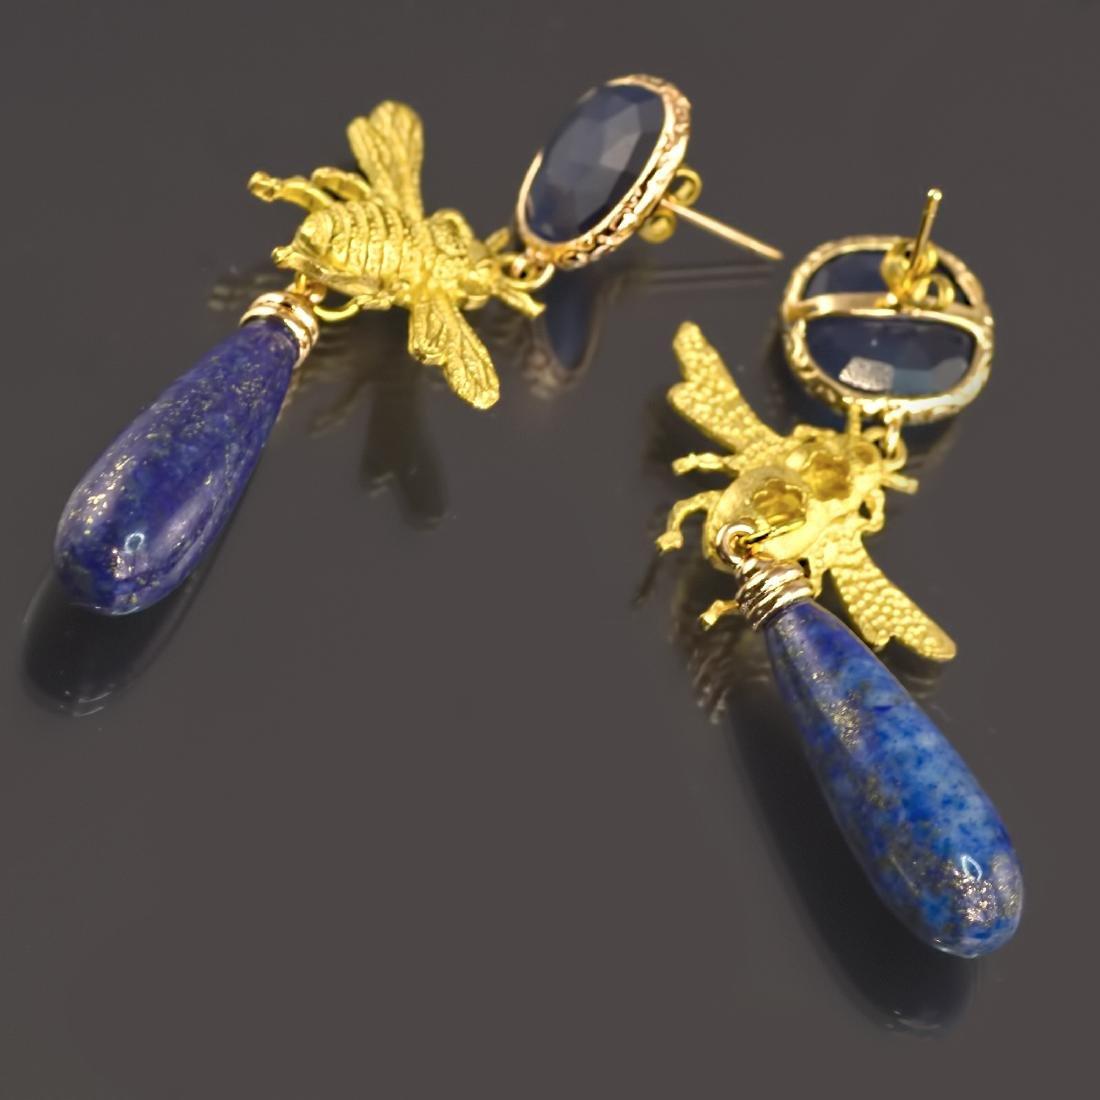 Lapis lazuli Fly Eye-catching Earrings - 3